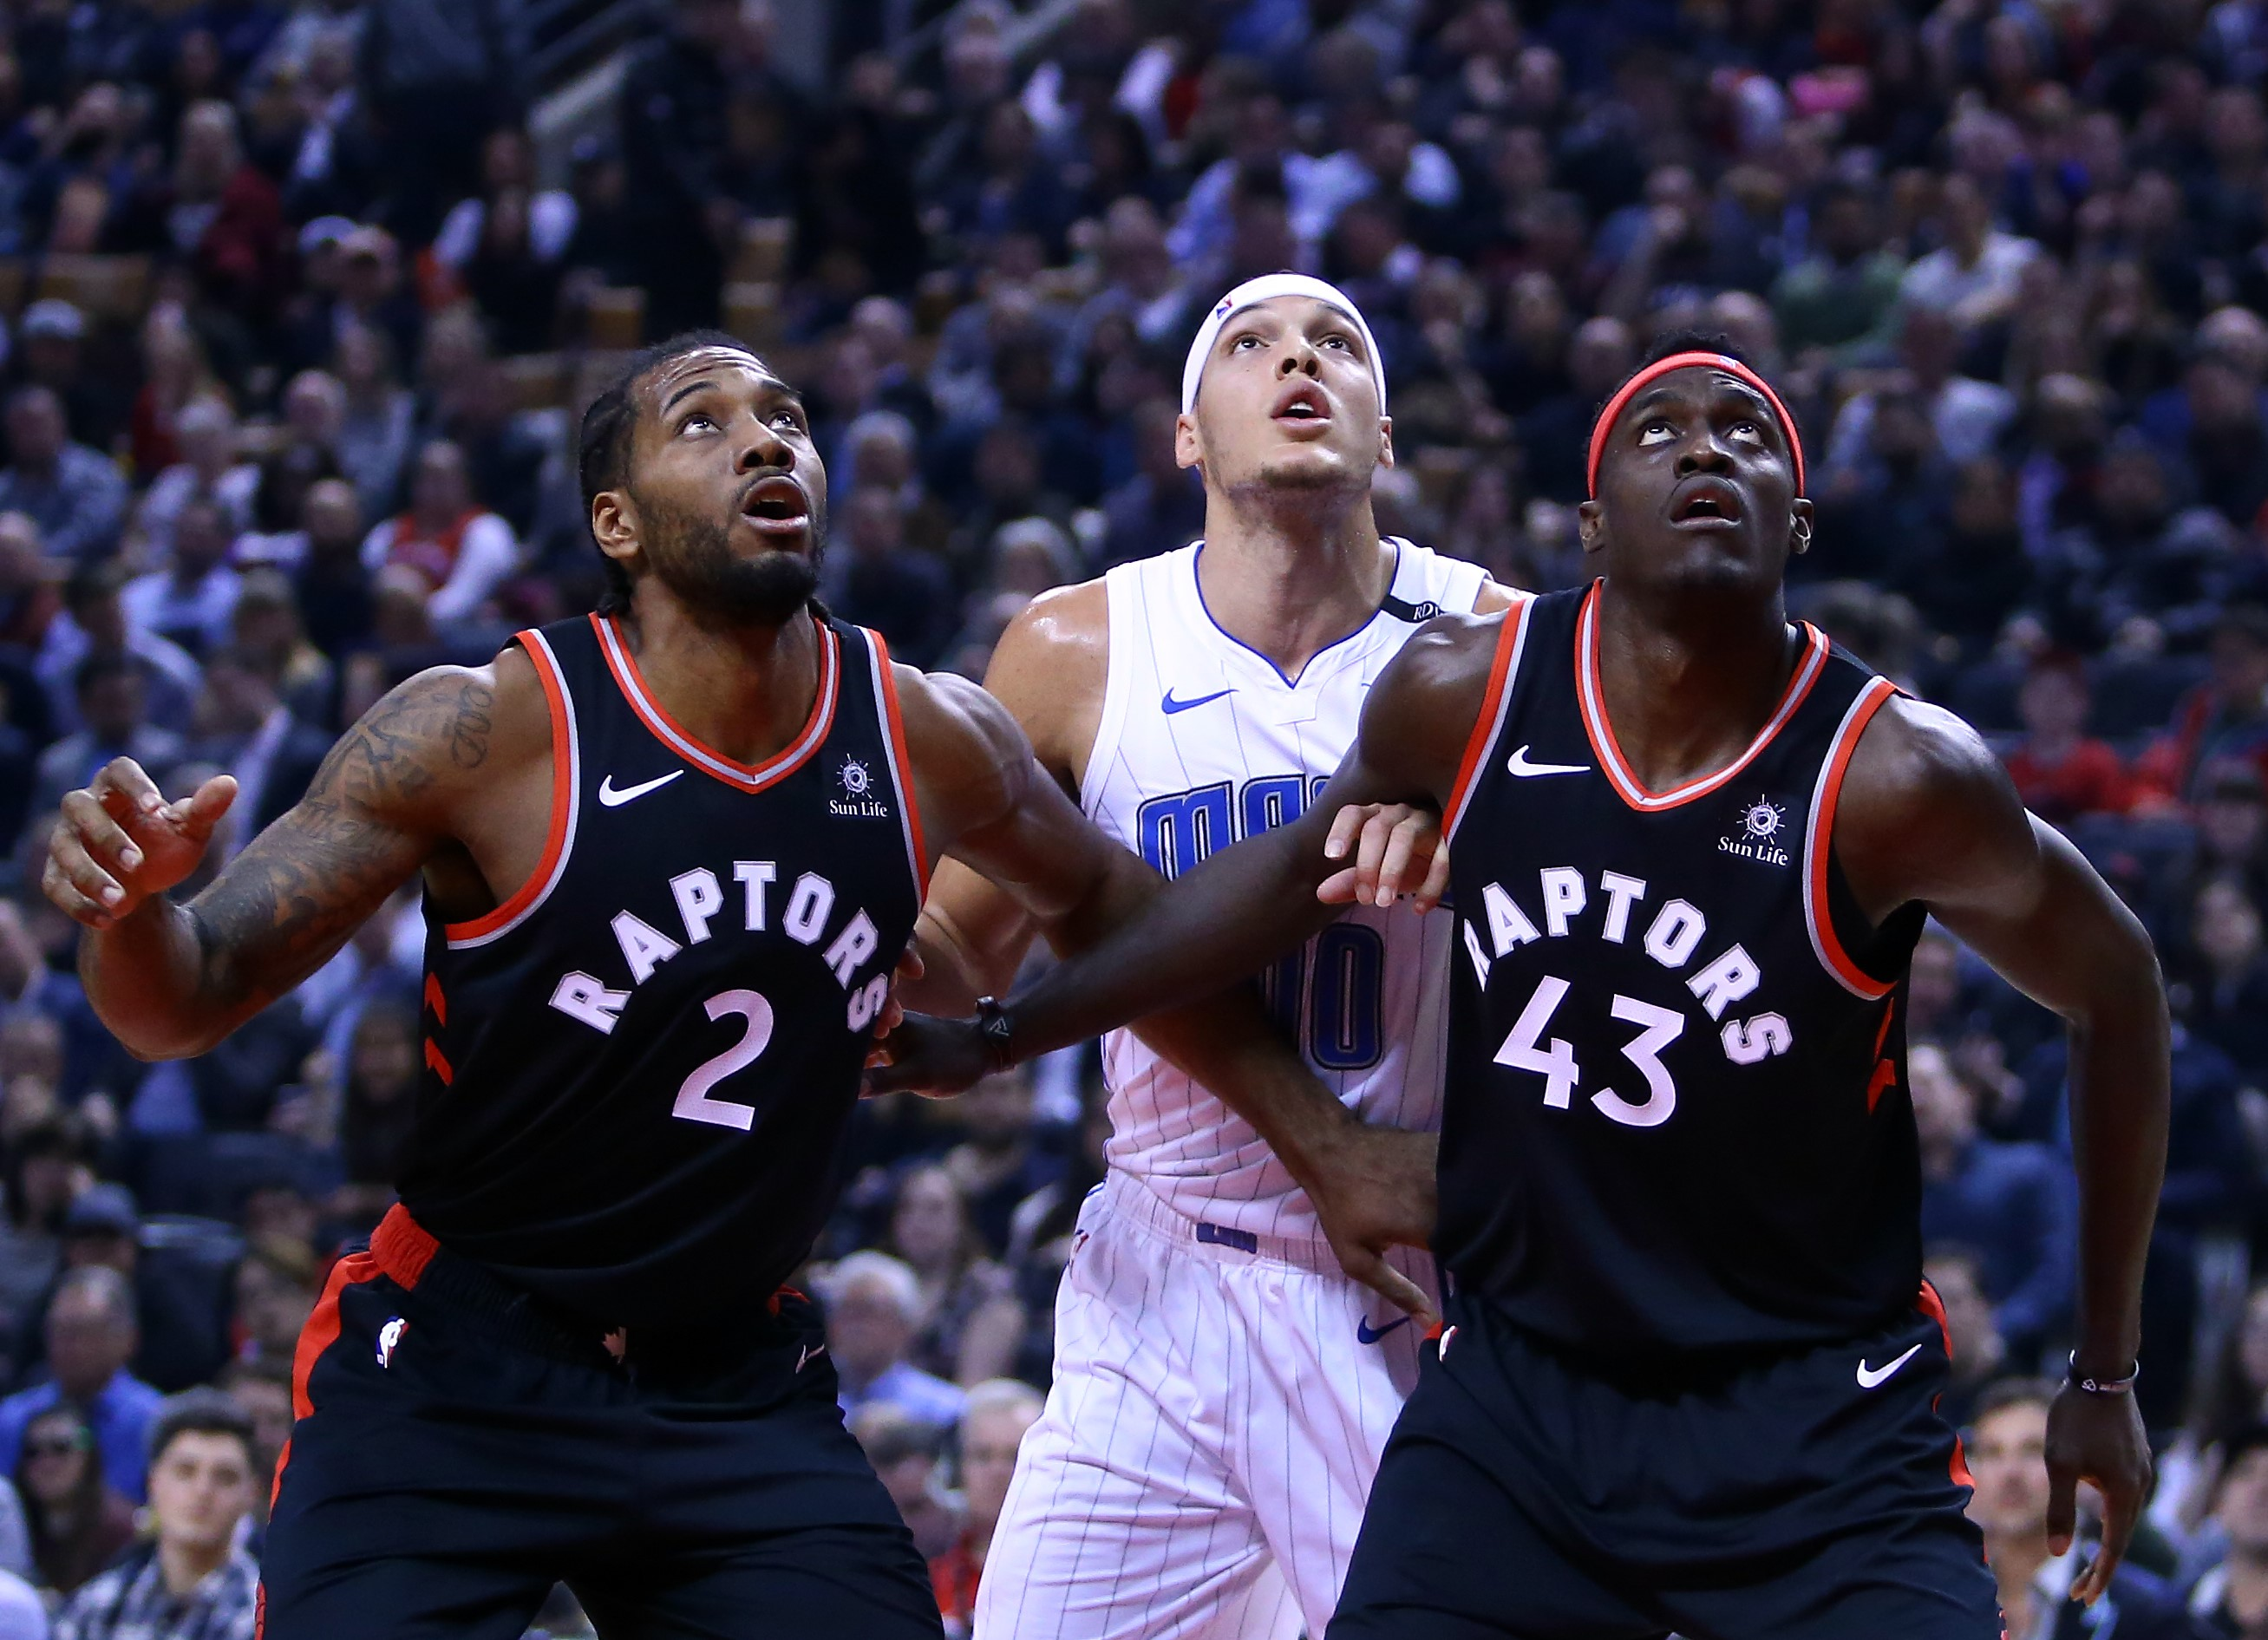 Kawhi Leonard, Pascal Siakam (Toronto Raptors) & Aaron Gordon (Orlando Magic)